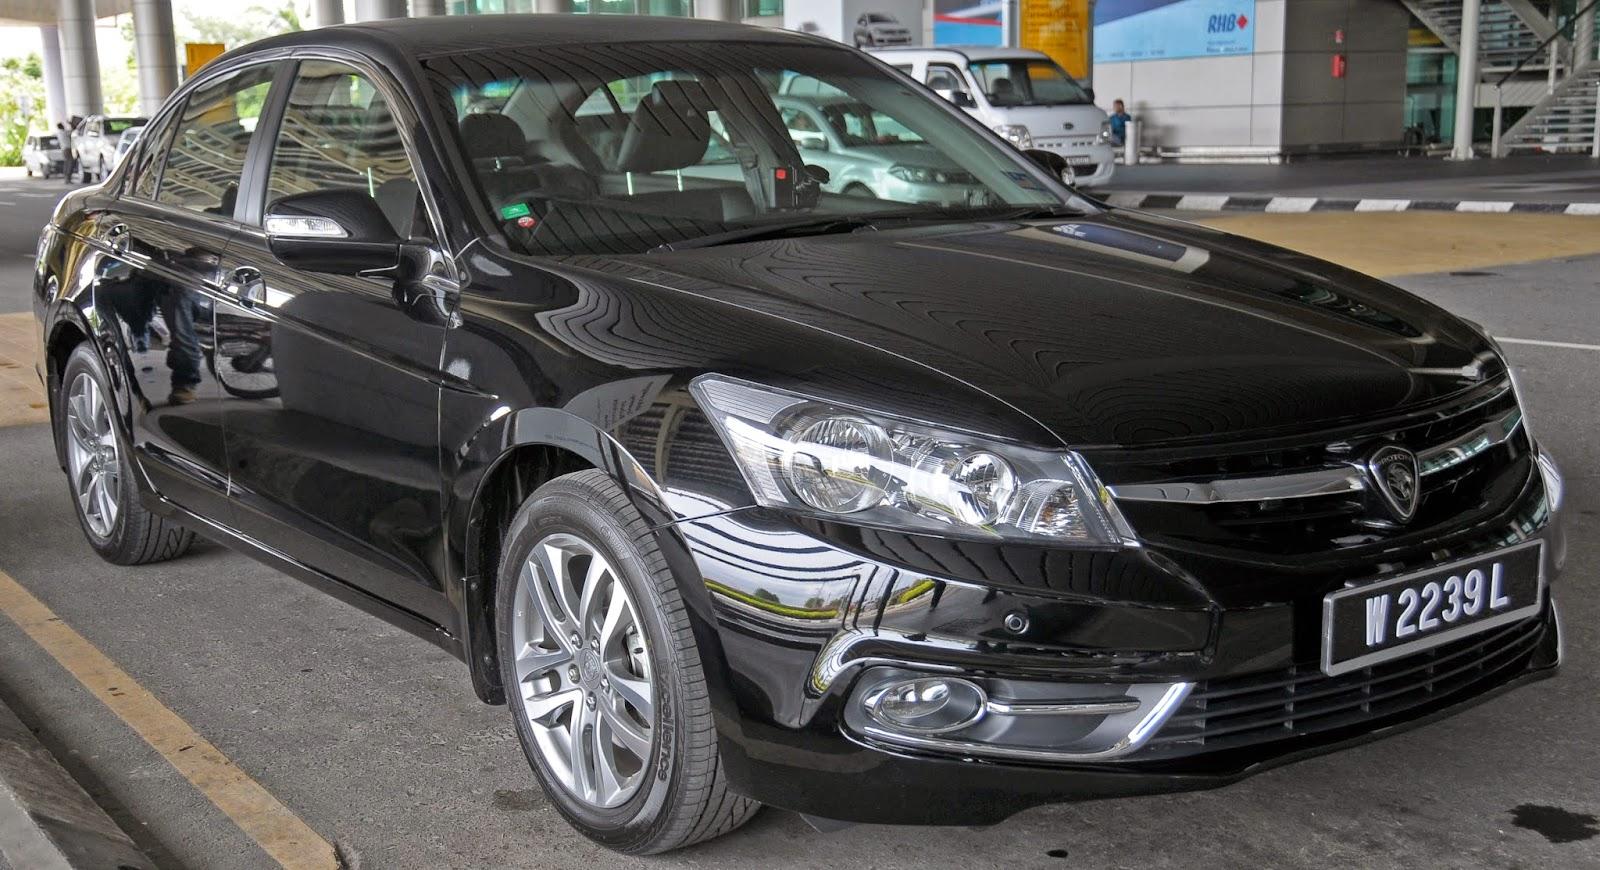 The 2014 Proton Perdana, a rebadged eighth generation Honda Accord.